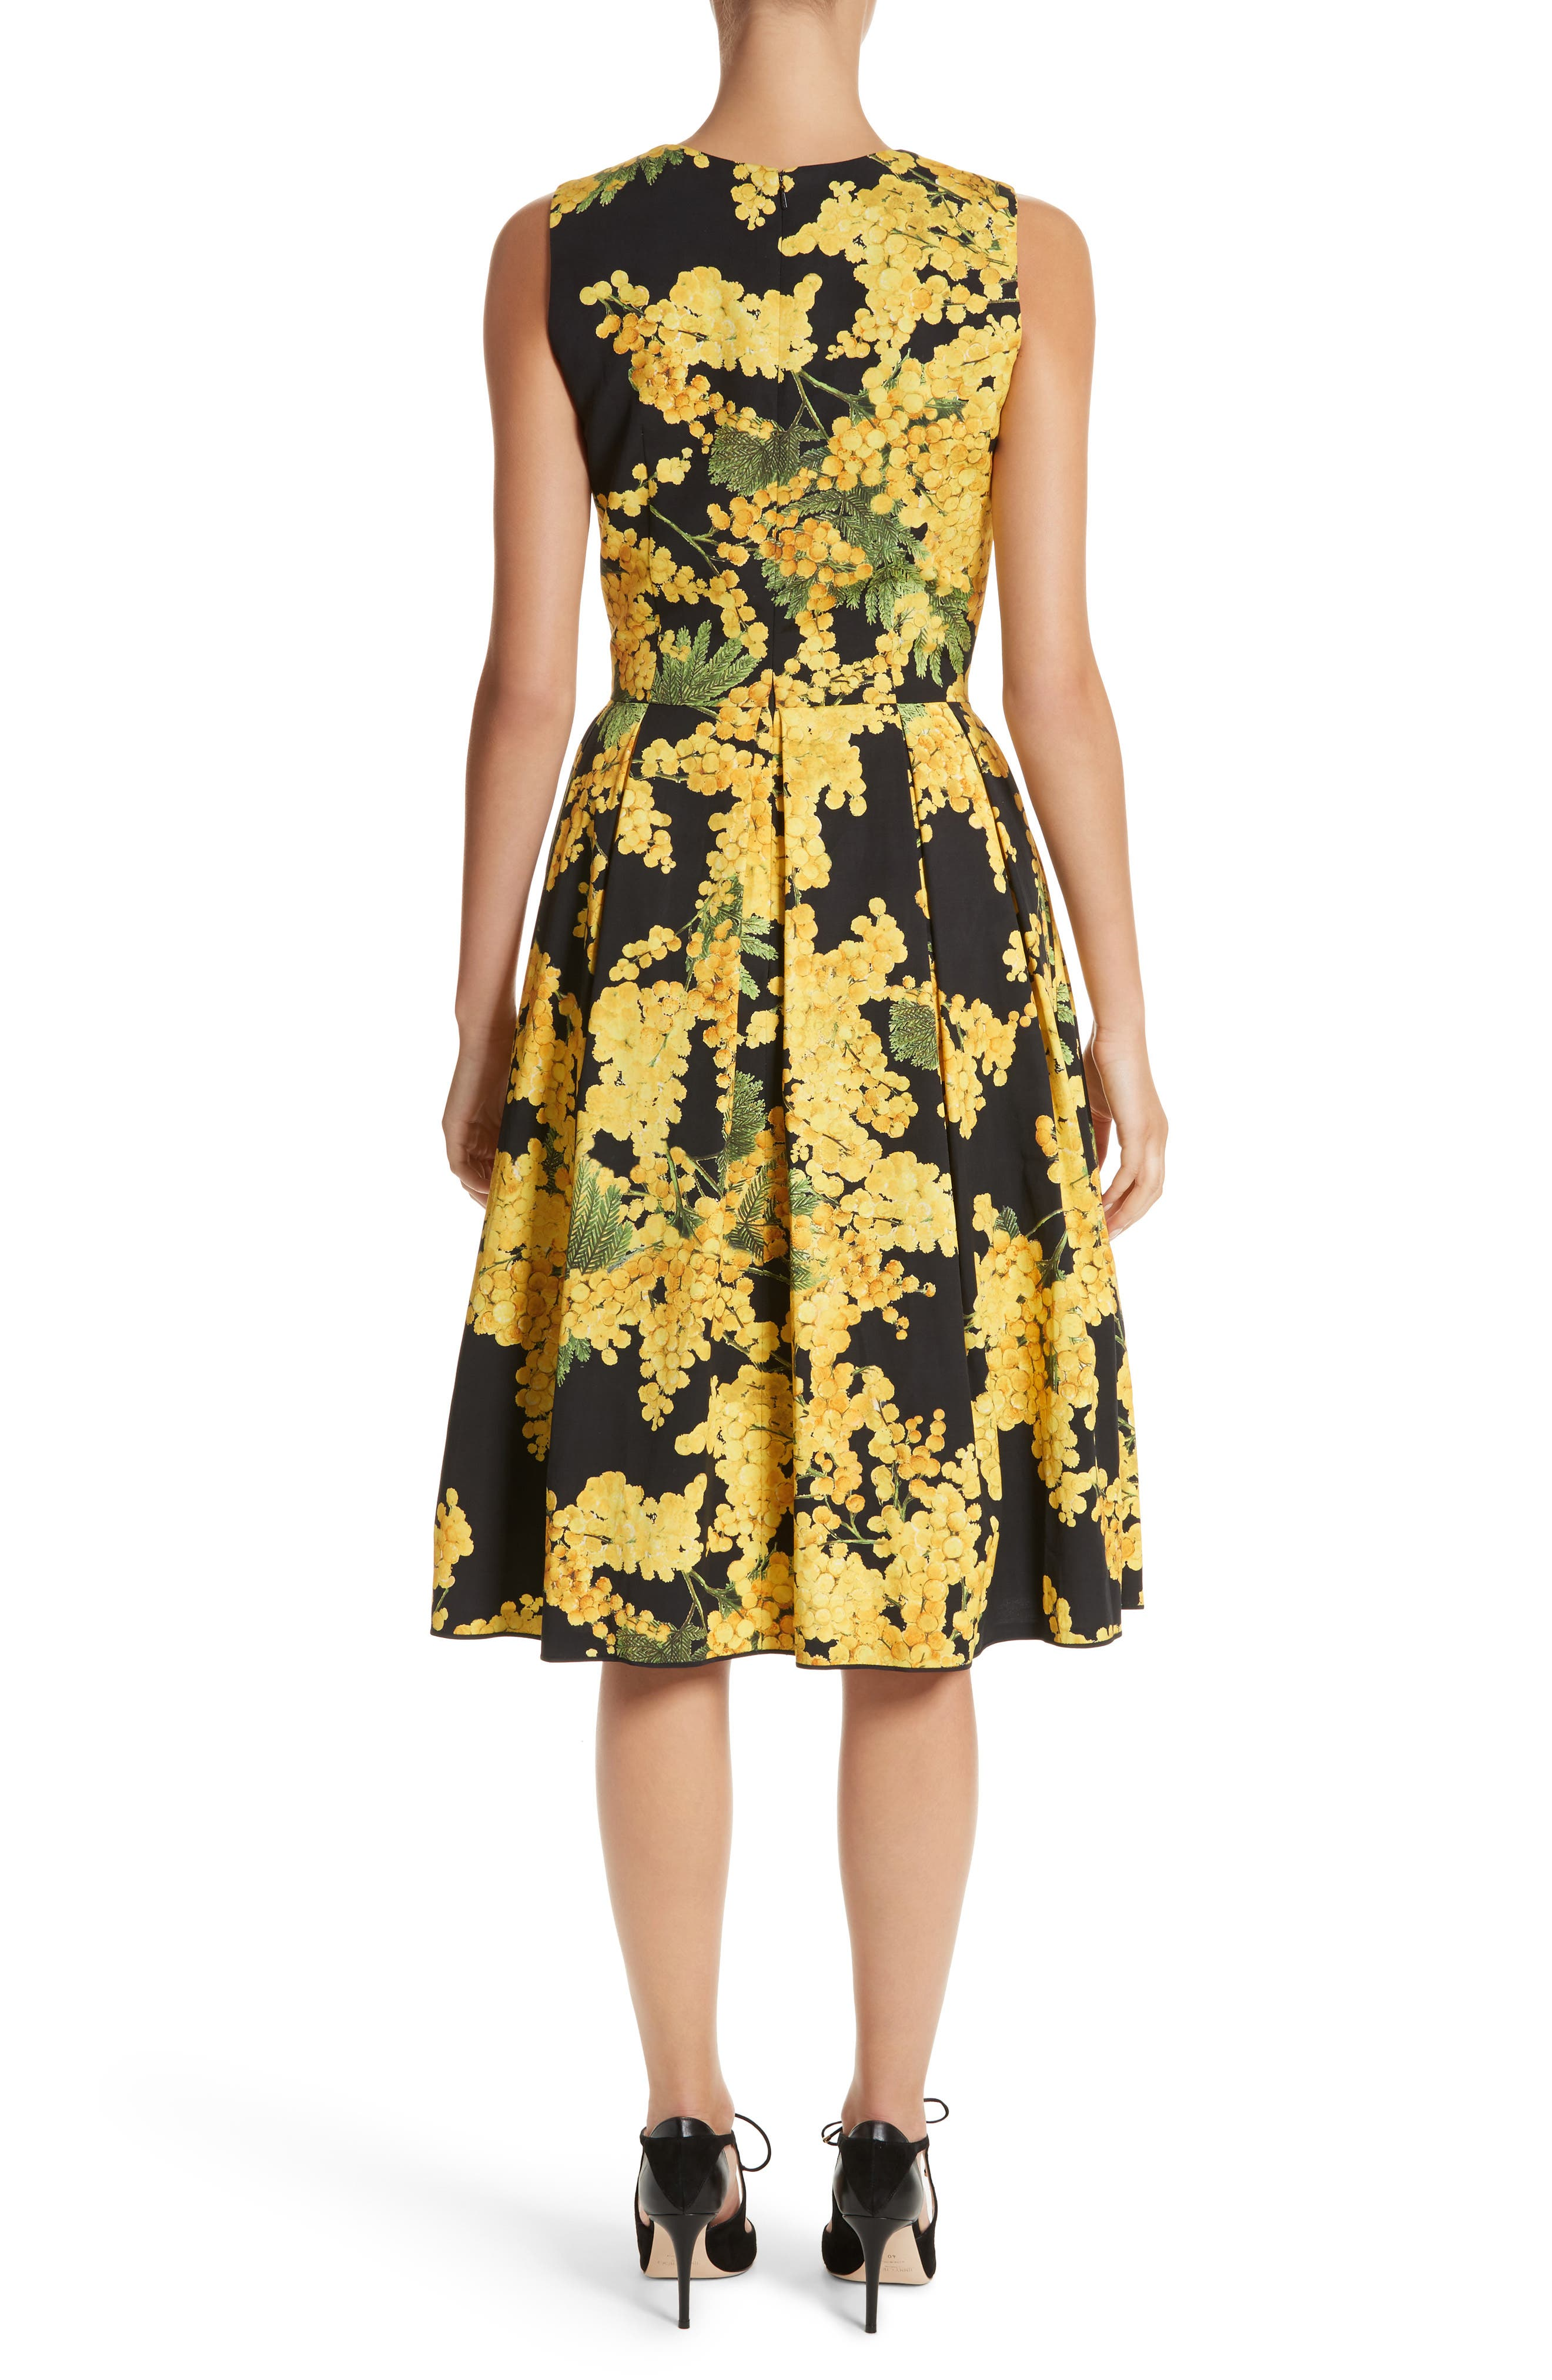 Floral Print Faille Day Dress,                             Alternate thumbnail 2, color,                             Freesia Yellow/Black